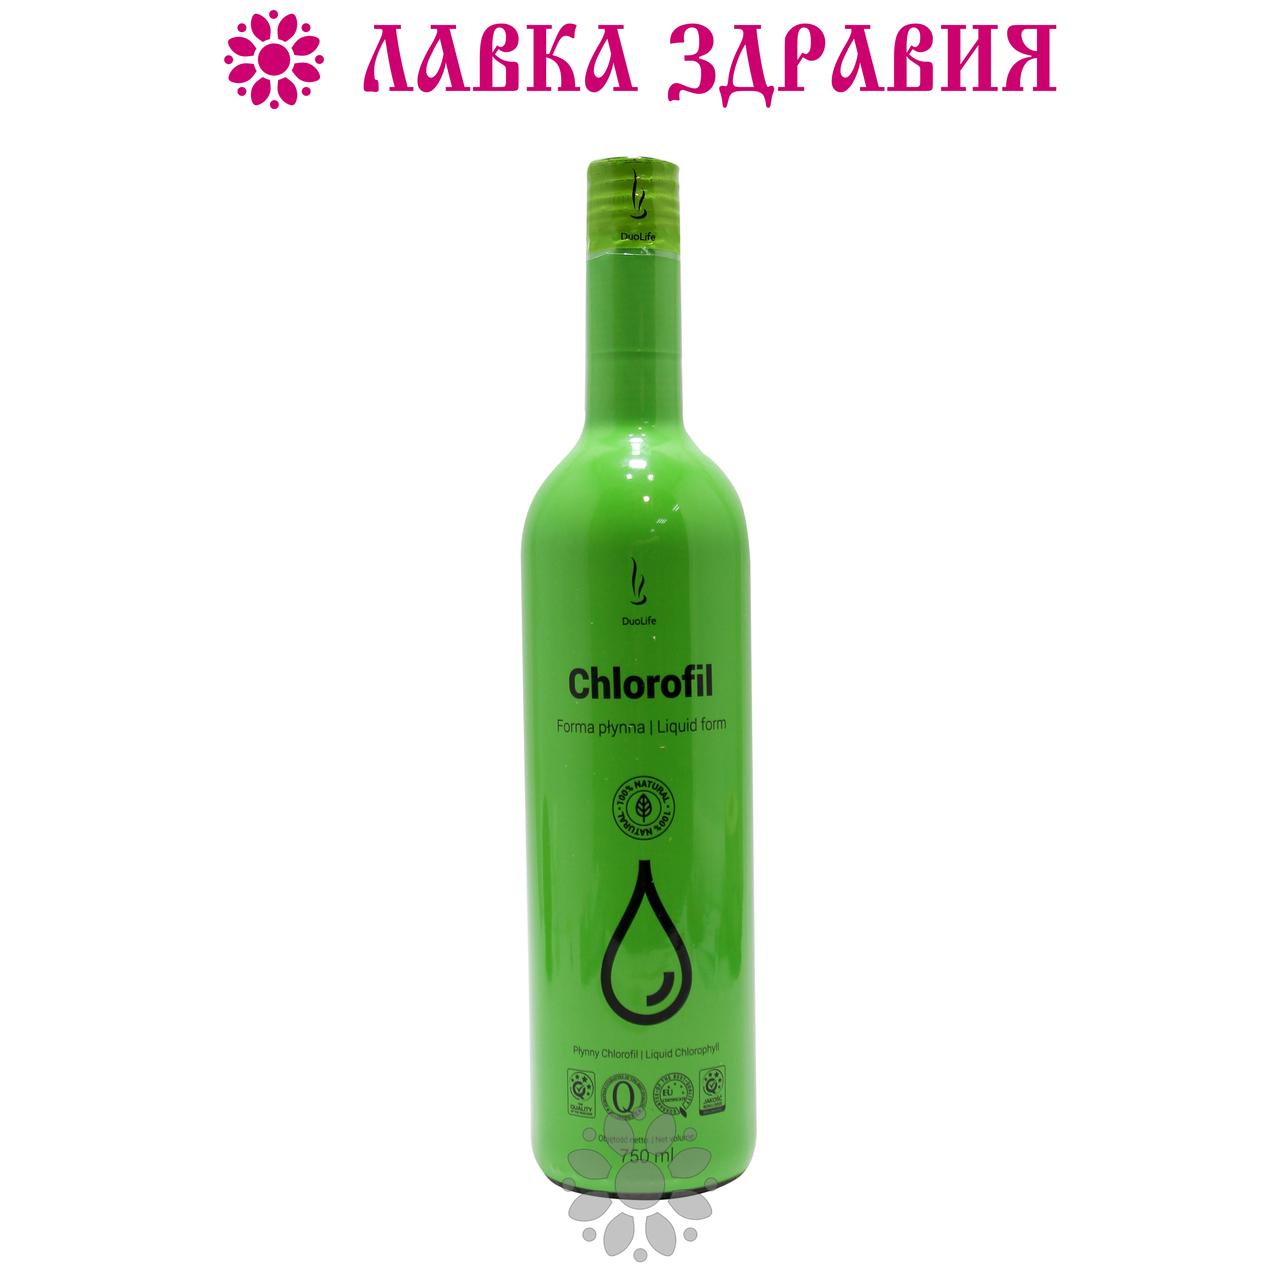 Хлорофилл, 750 мл, Duolife